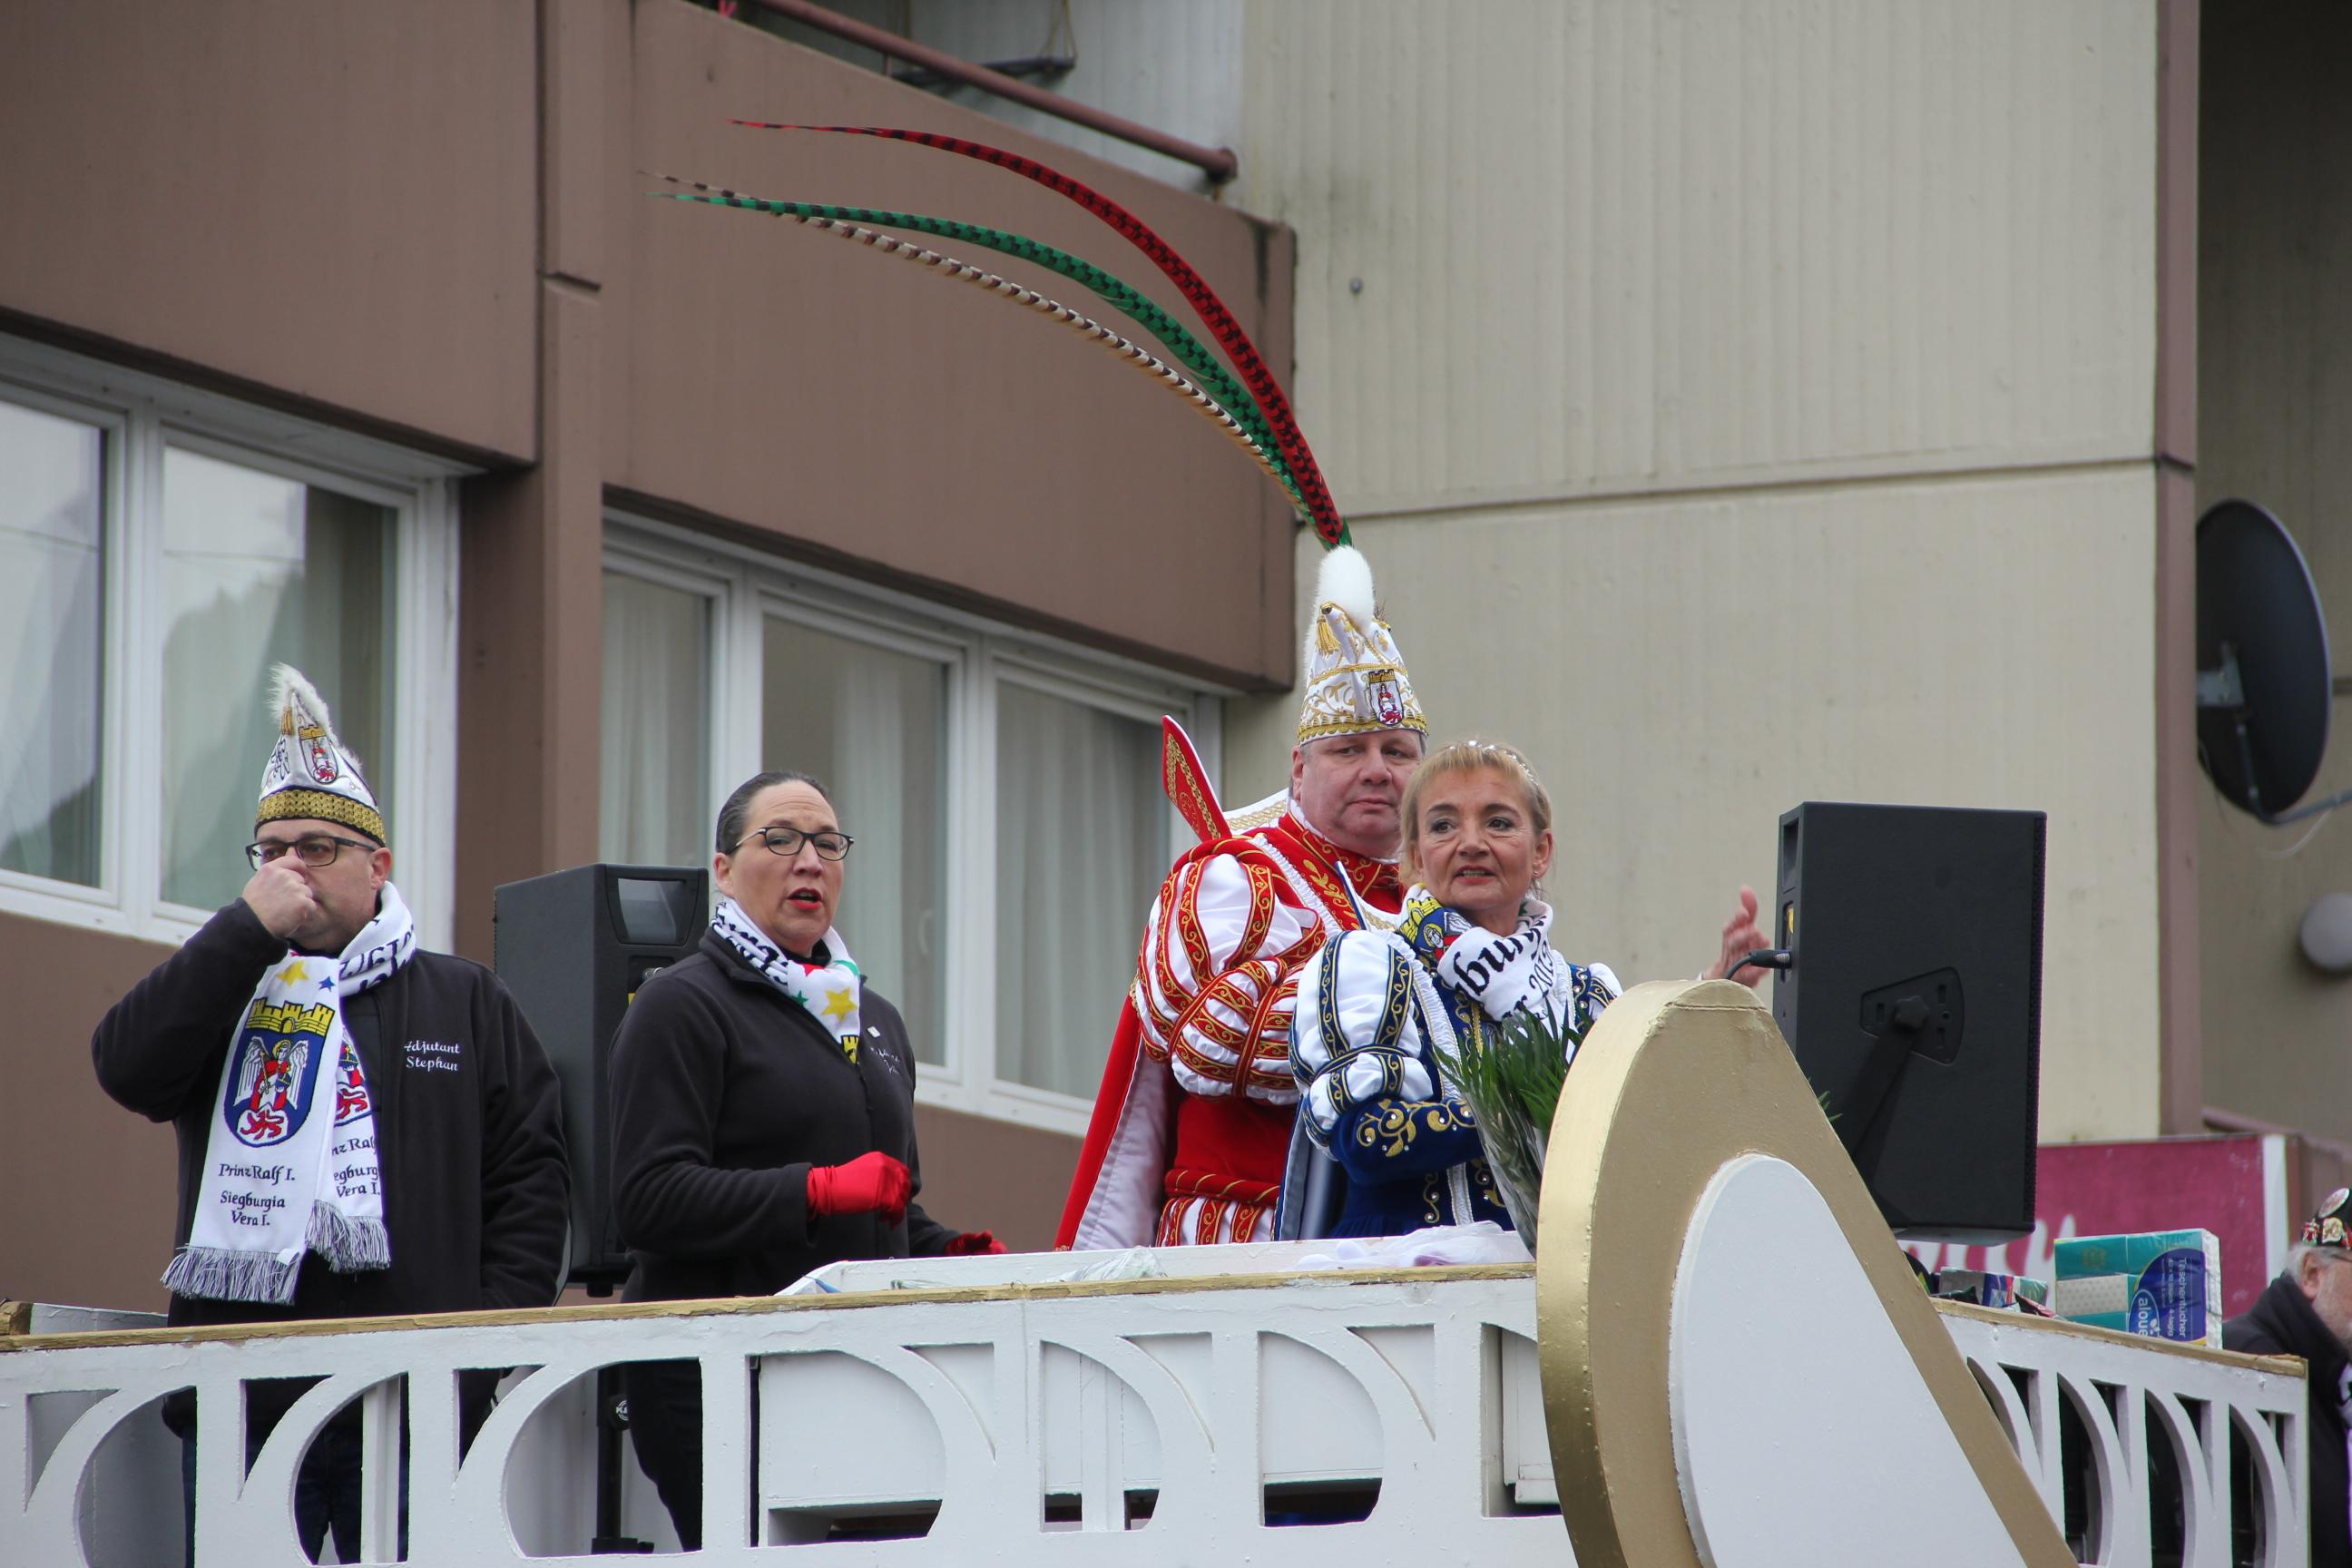 2020-02-24 Rosenmontag Siegburg (163)